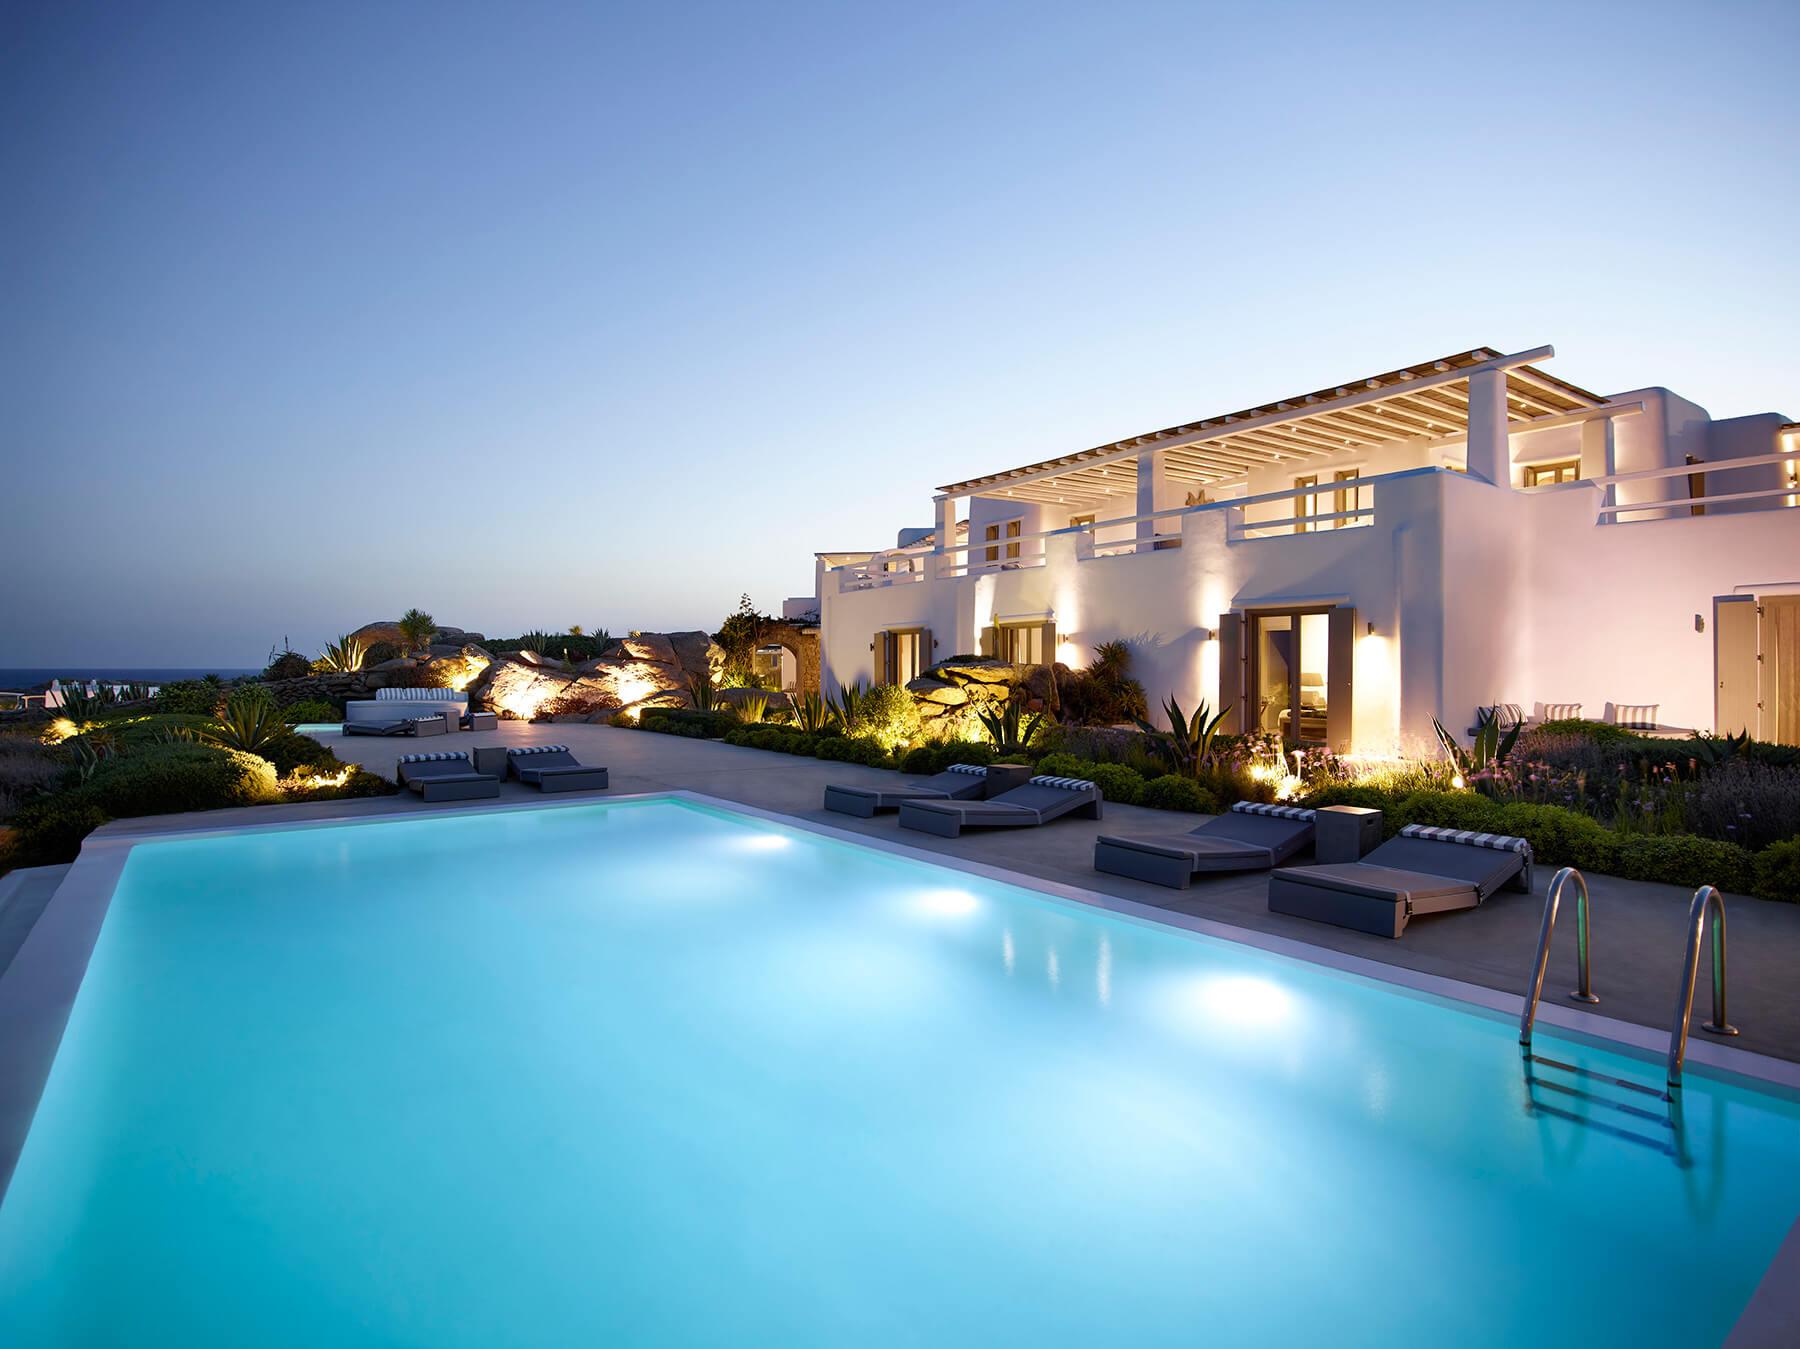 Mykonos superior hospitality